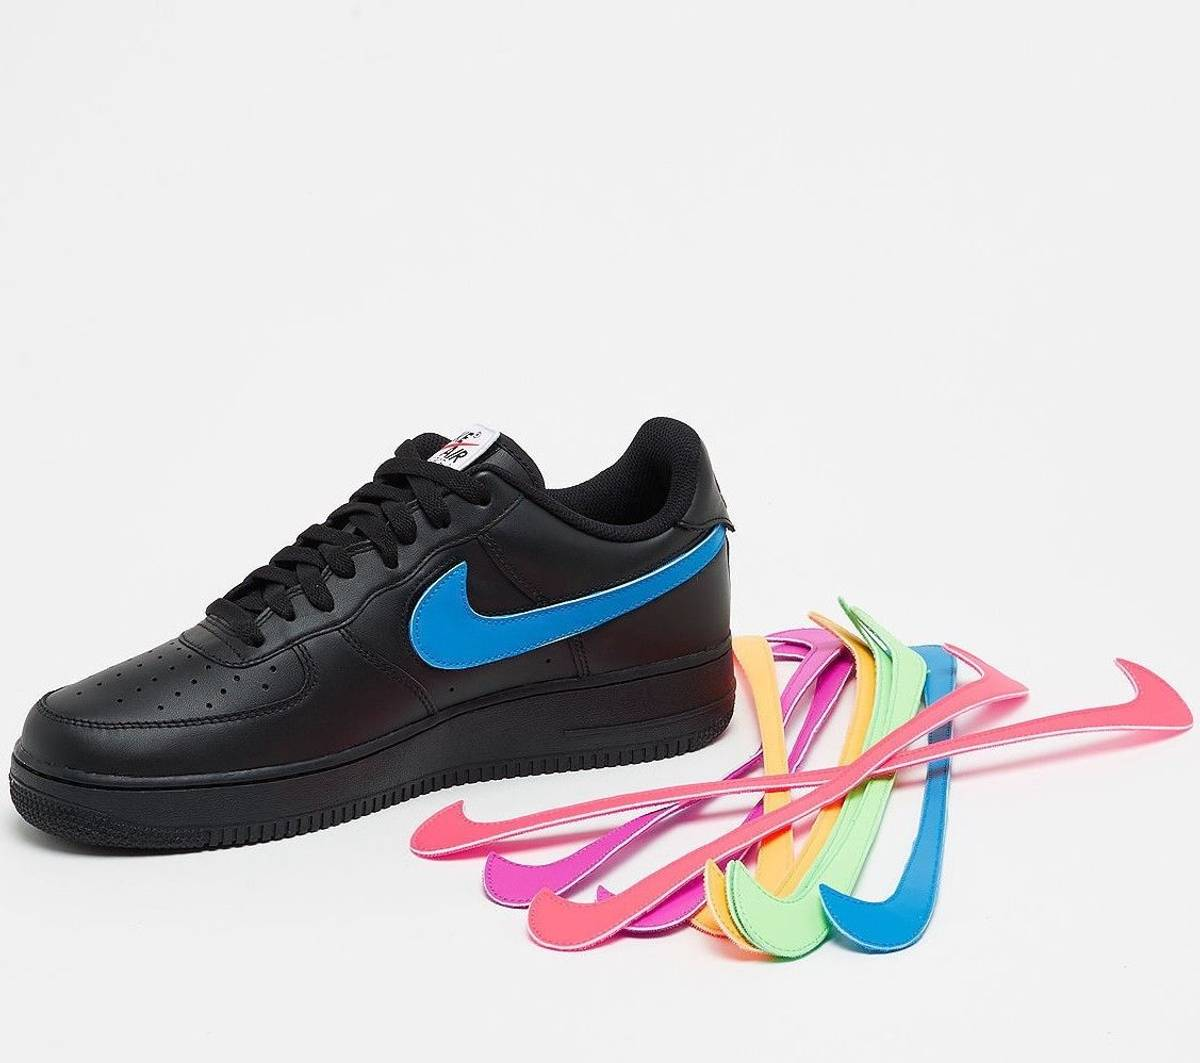 Nike Sportswear Air Force 1 07 QS Velcro Swoosh Pack